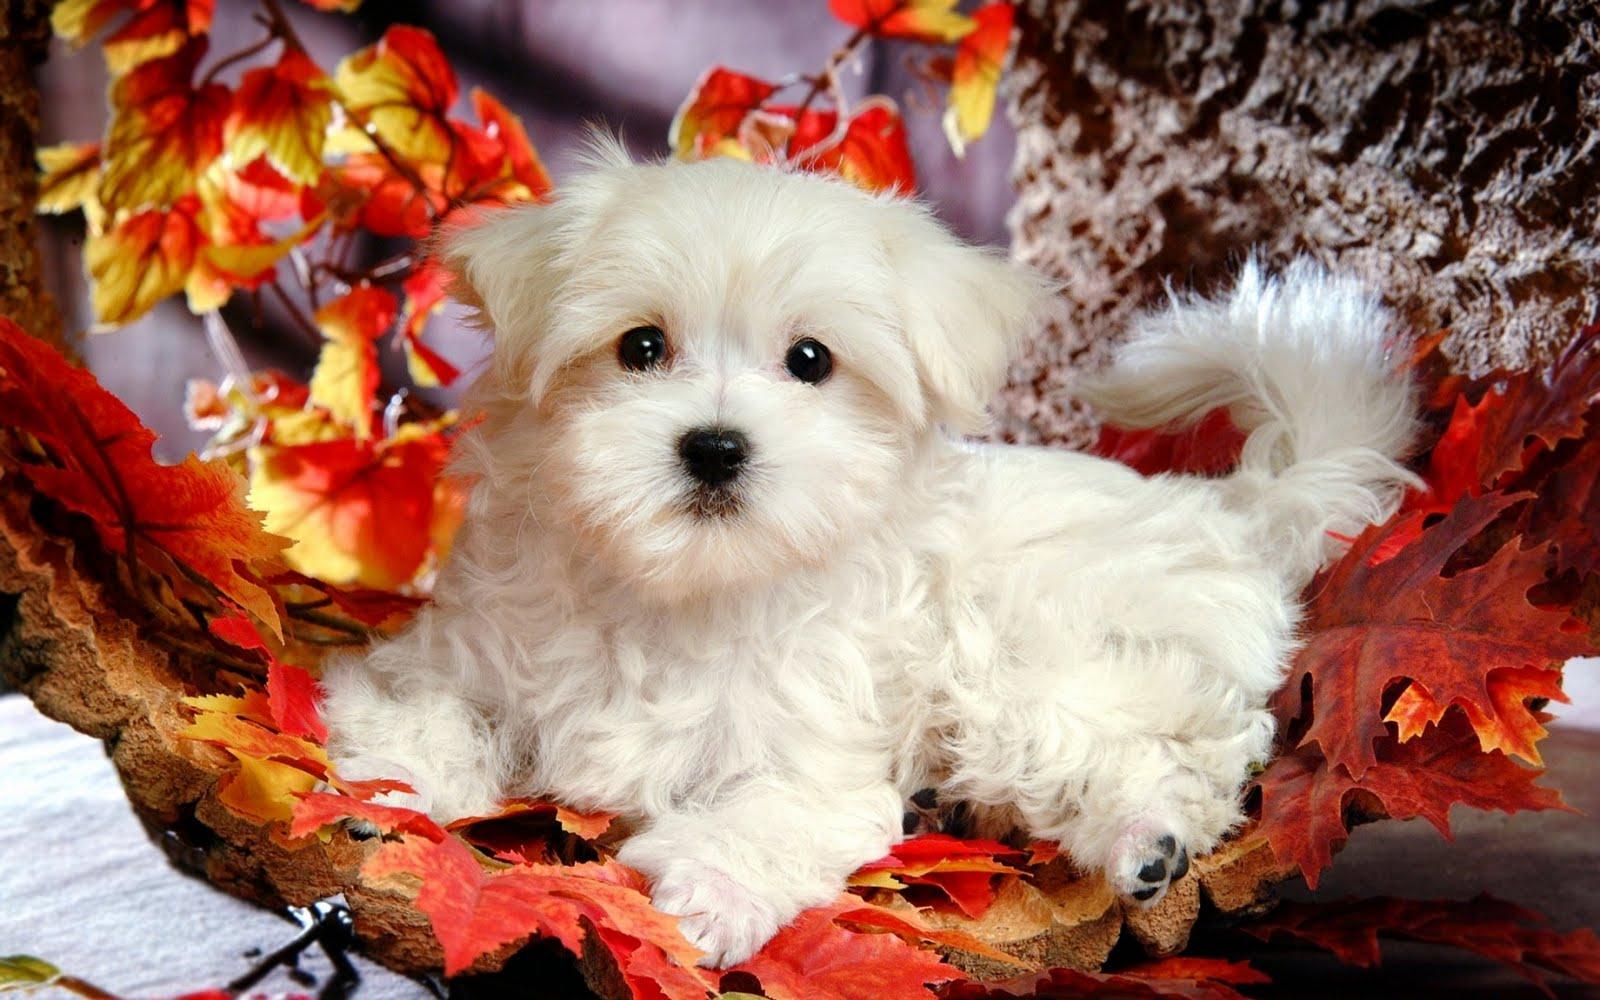 http://4.bp.blogspot.com/_2IU2Nt4rD1k/TC40TCLf2VI/AAAAAAAABy0/oz4mwlkTKkc/s1600/cute_dogie_on_1680x1050.jpg